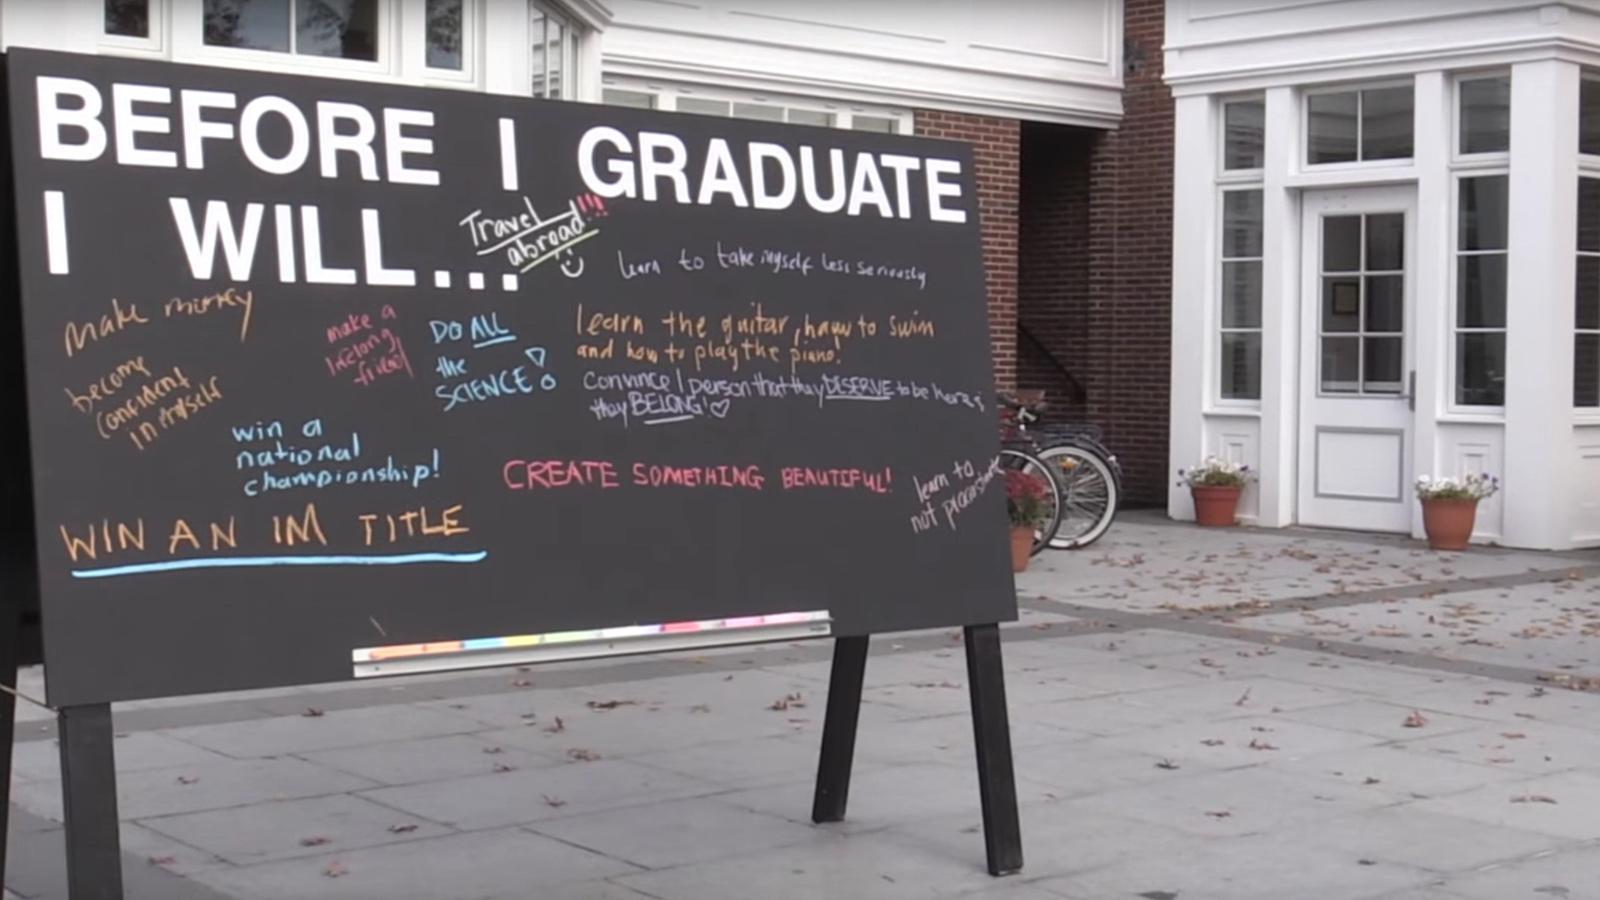 Before I Graduate